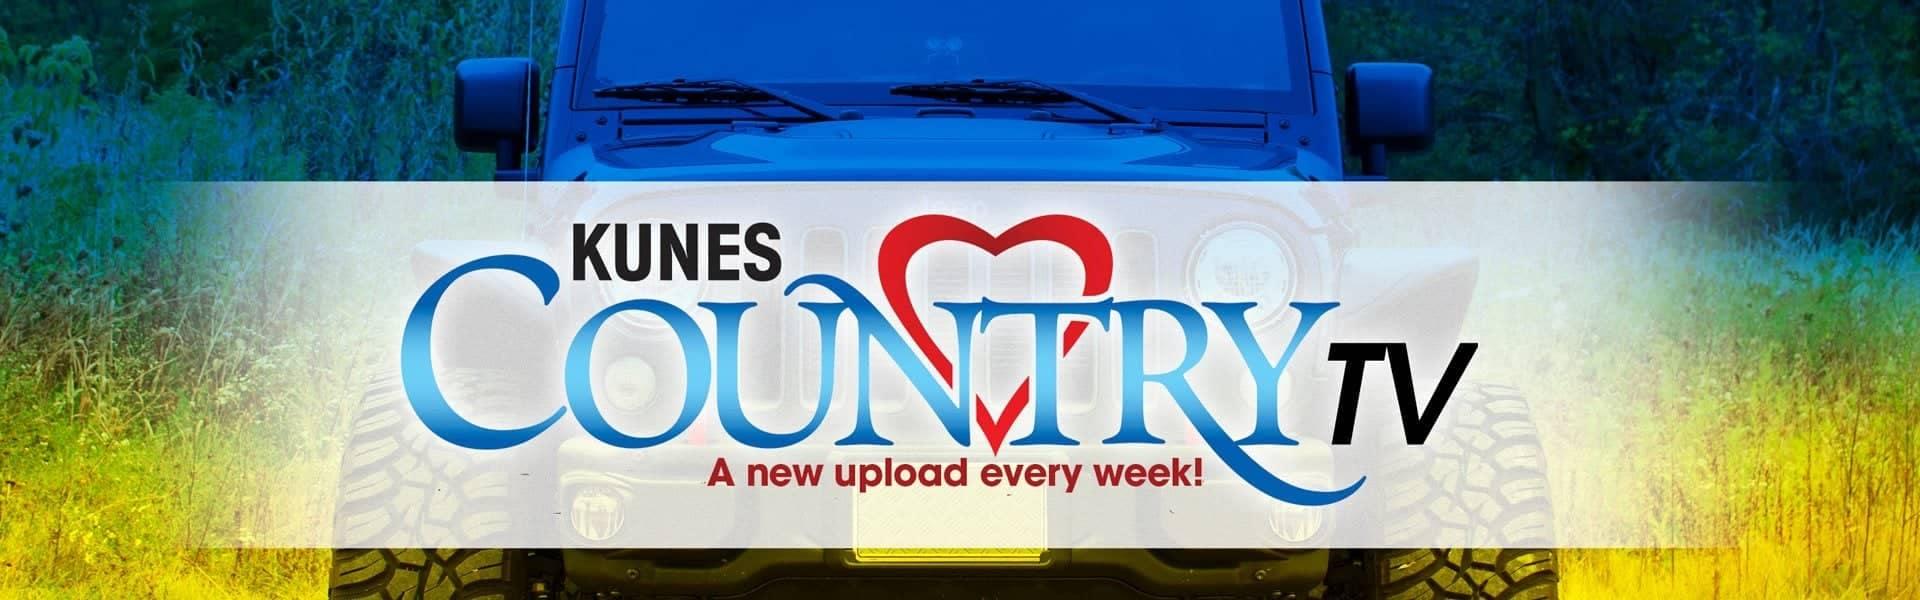 Kunes_Country_TV